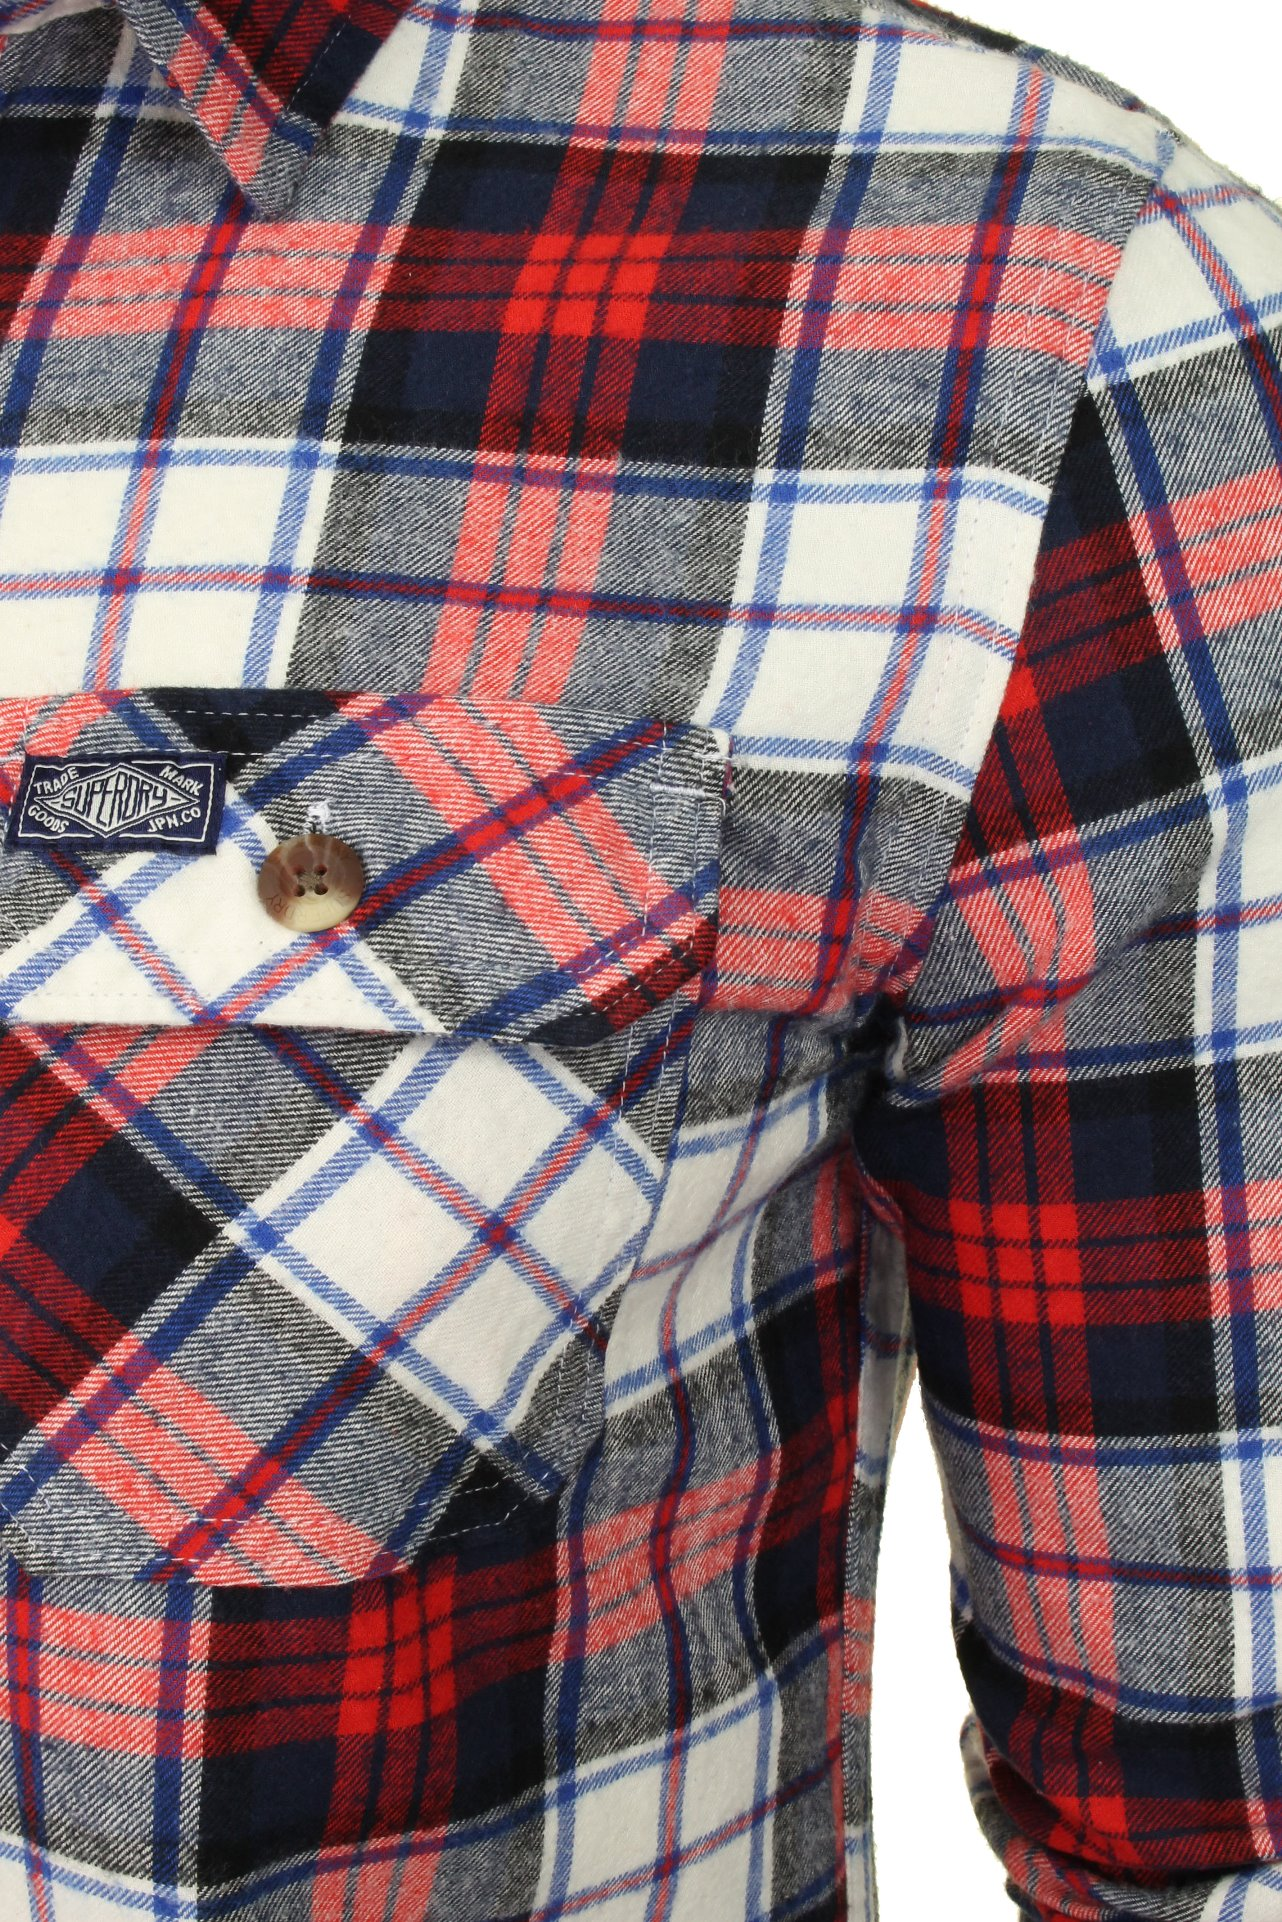 Superdry-Mens-Check-Shirt-039-Classic-Lumberjack-Shirt-039-Long-Sleeved thumbnail 7